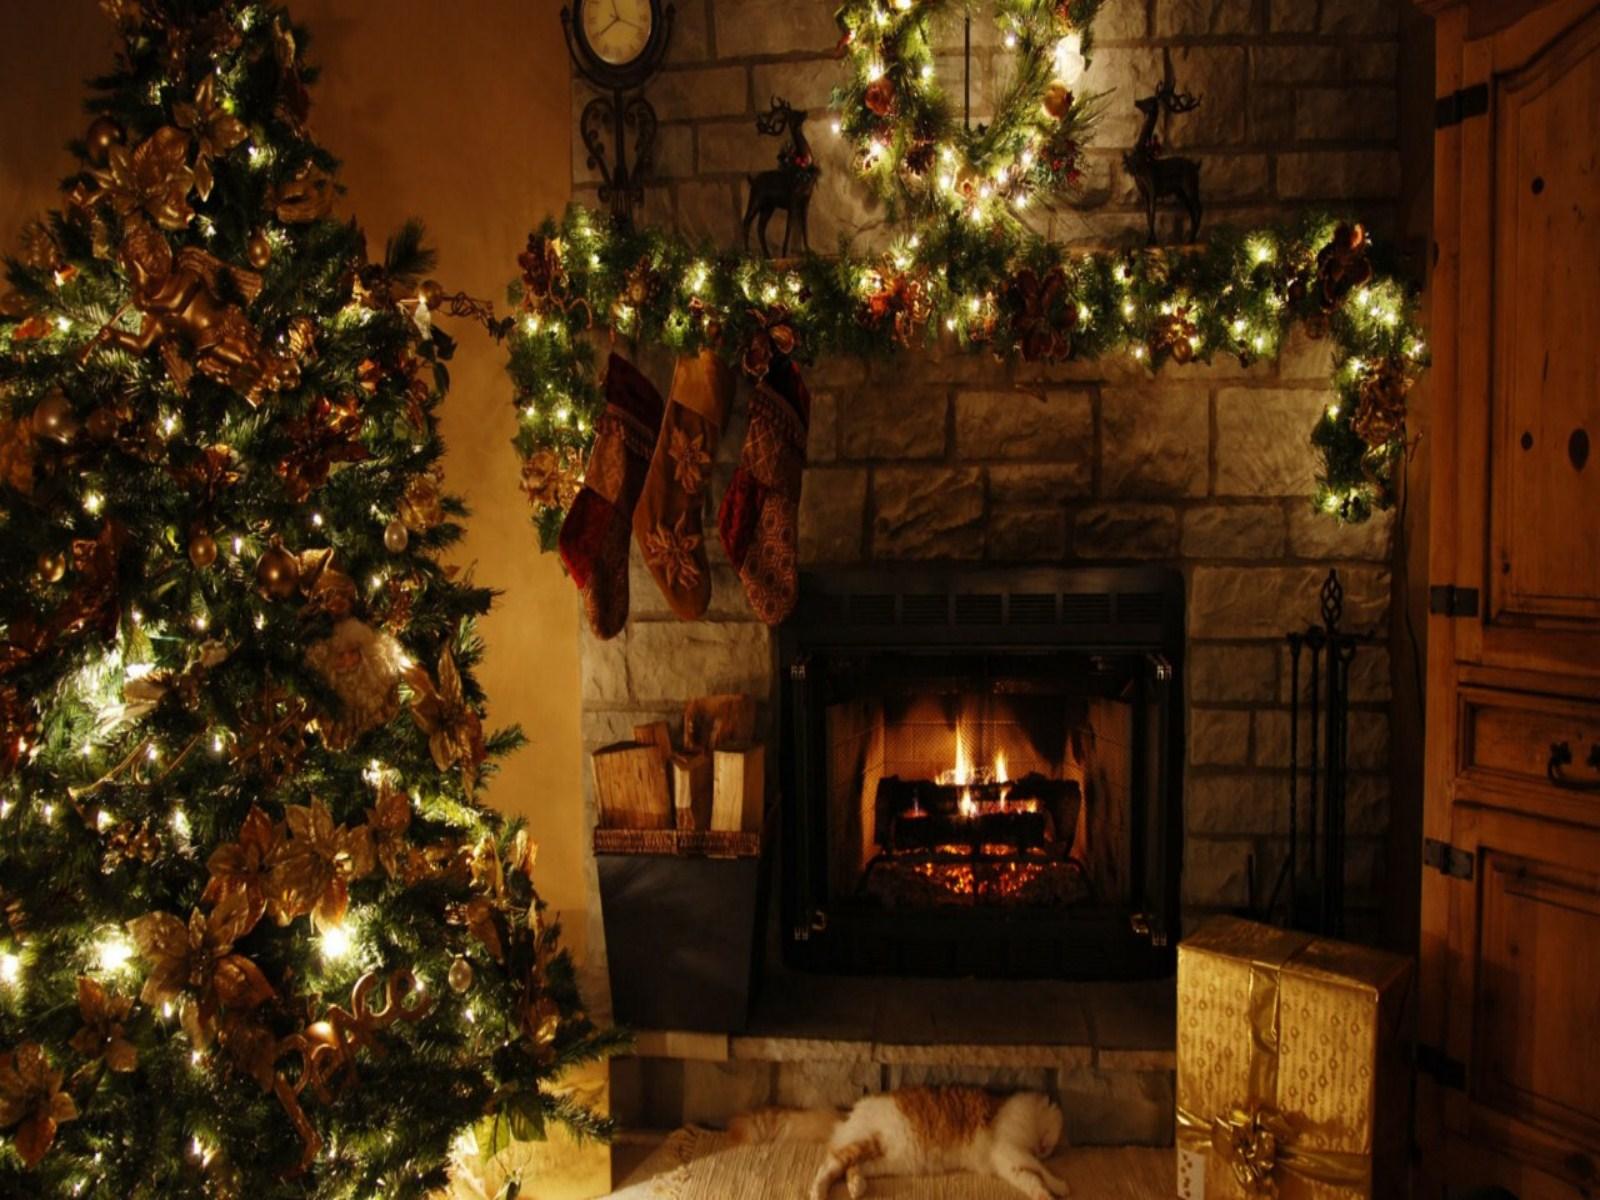 Christmas Fireplace Wallpapers myideasbedroomcom 1600x1200